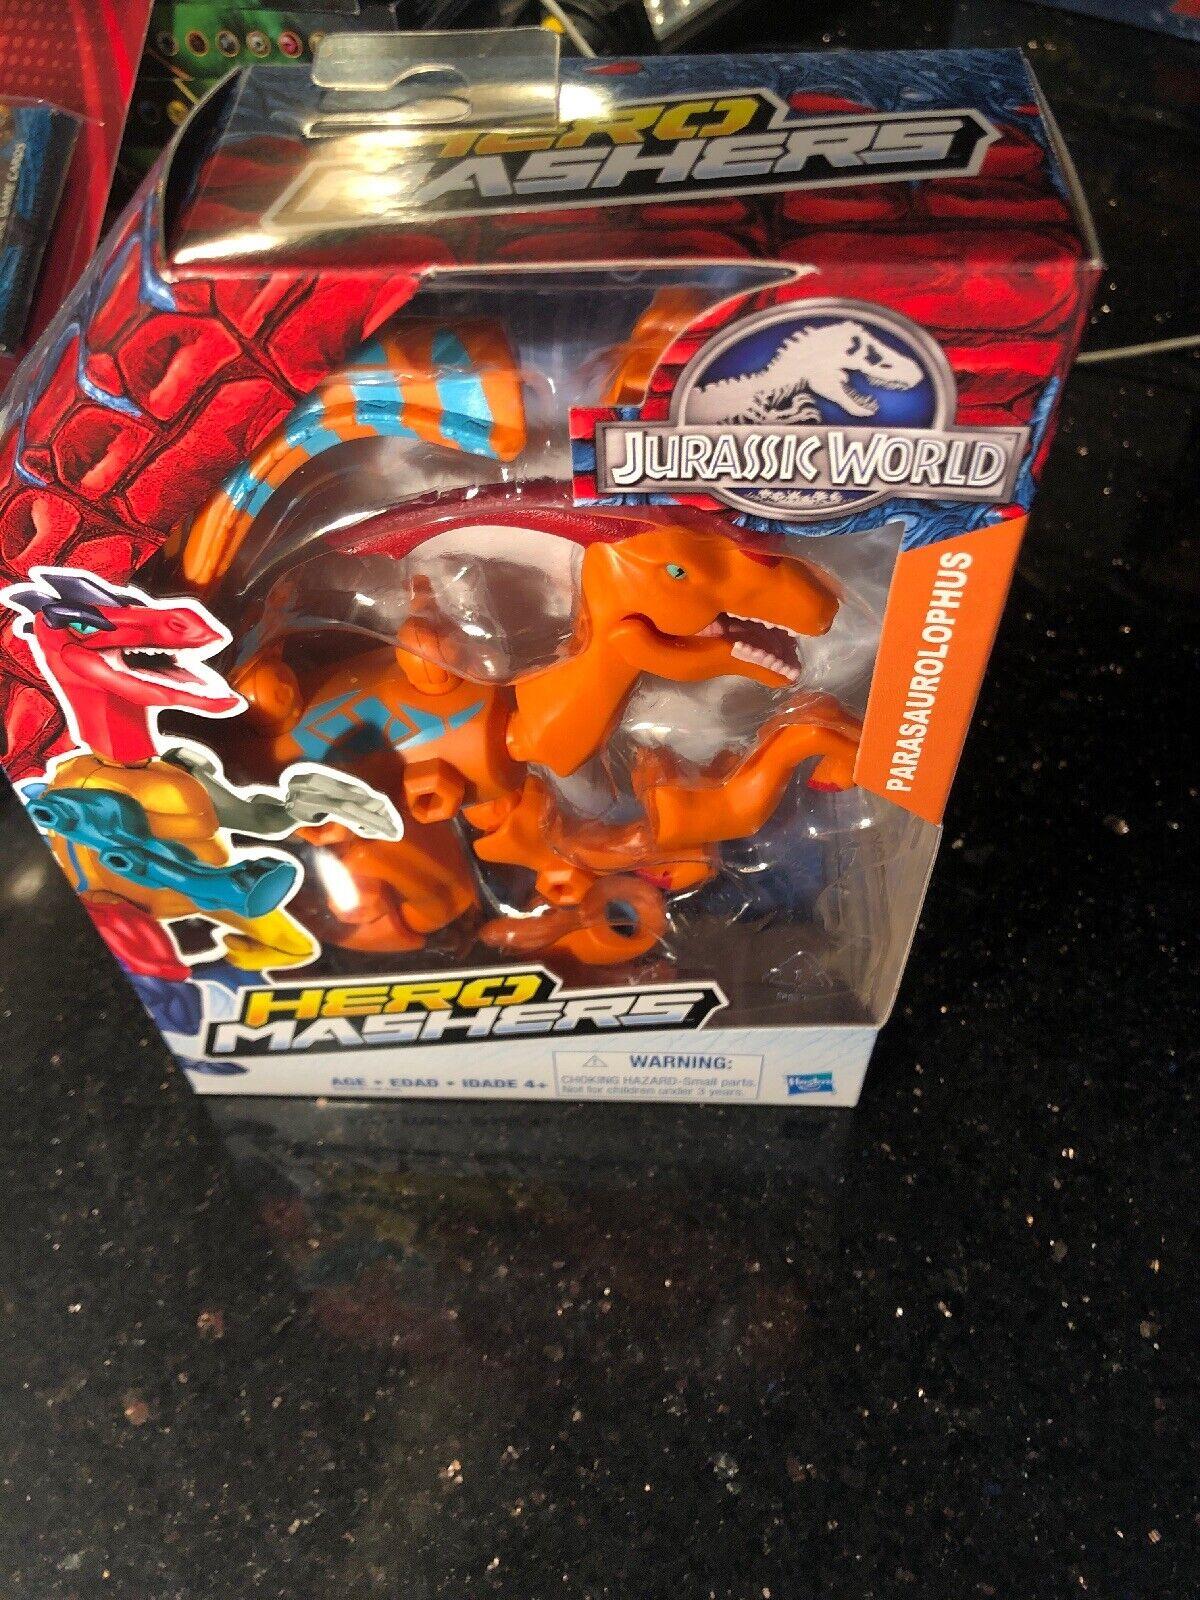 Jurassic World Hero Mashers Parasaurolophus Action Figure Hasbro New